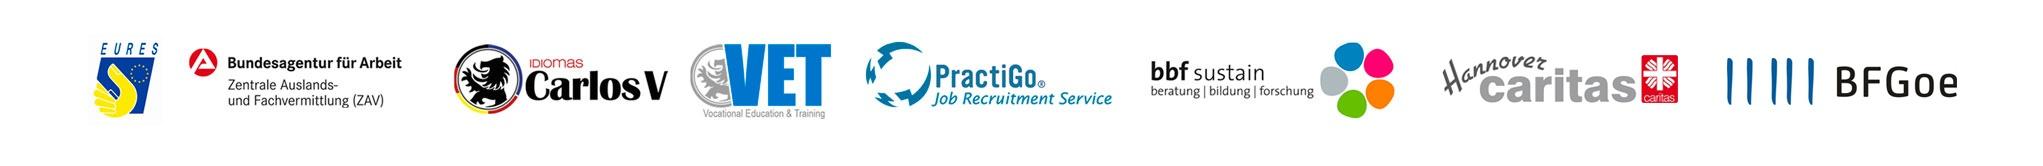 Fie Logos 2 1 Contrato de trabajo como Educador/a Infantil